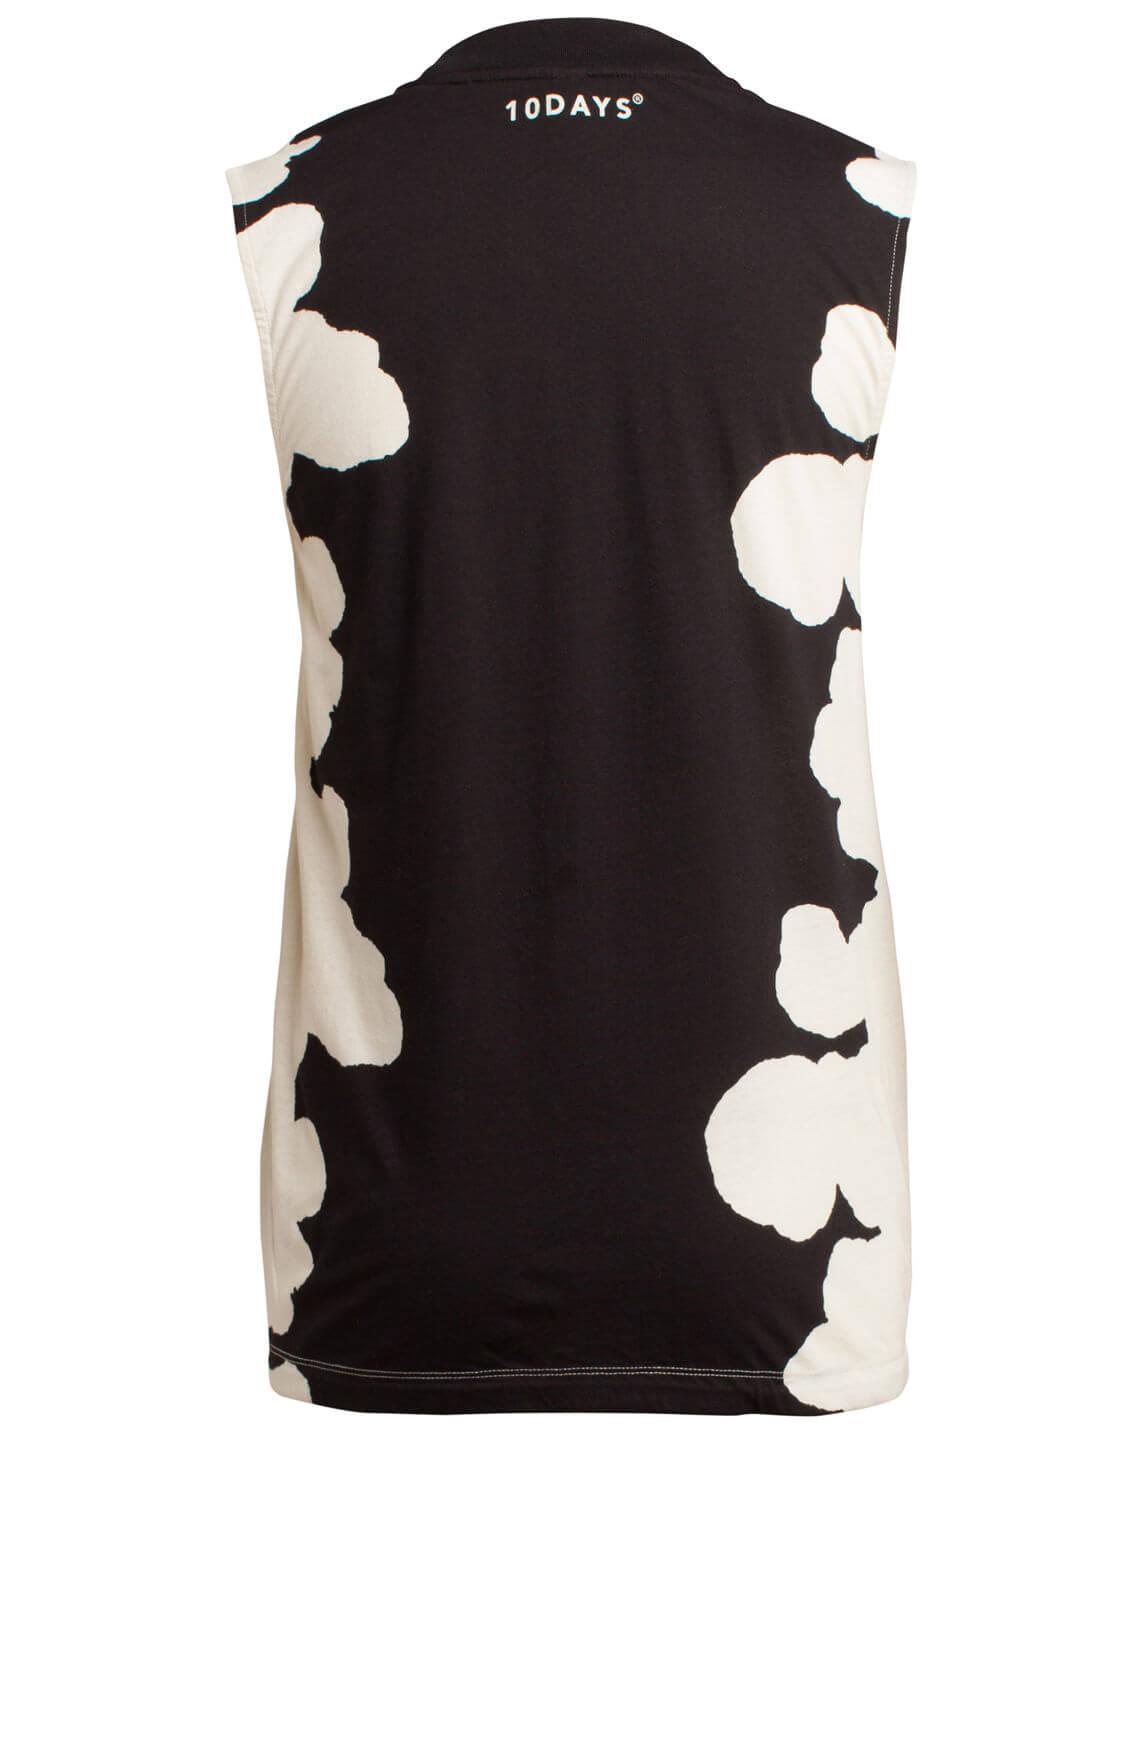 10 Days Dames Top met gevlekte print zwart